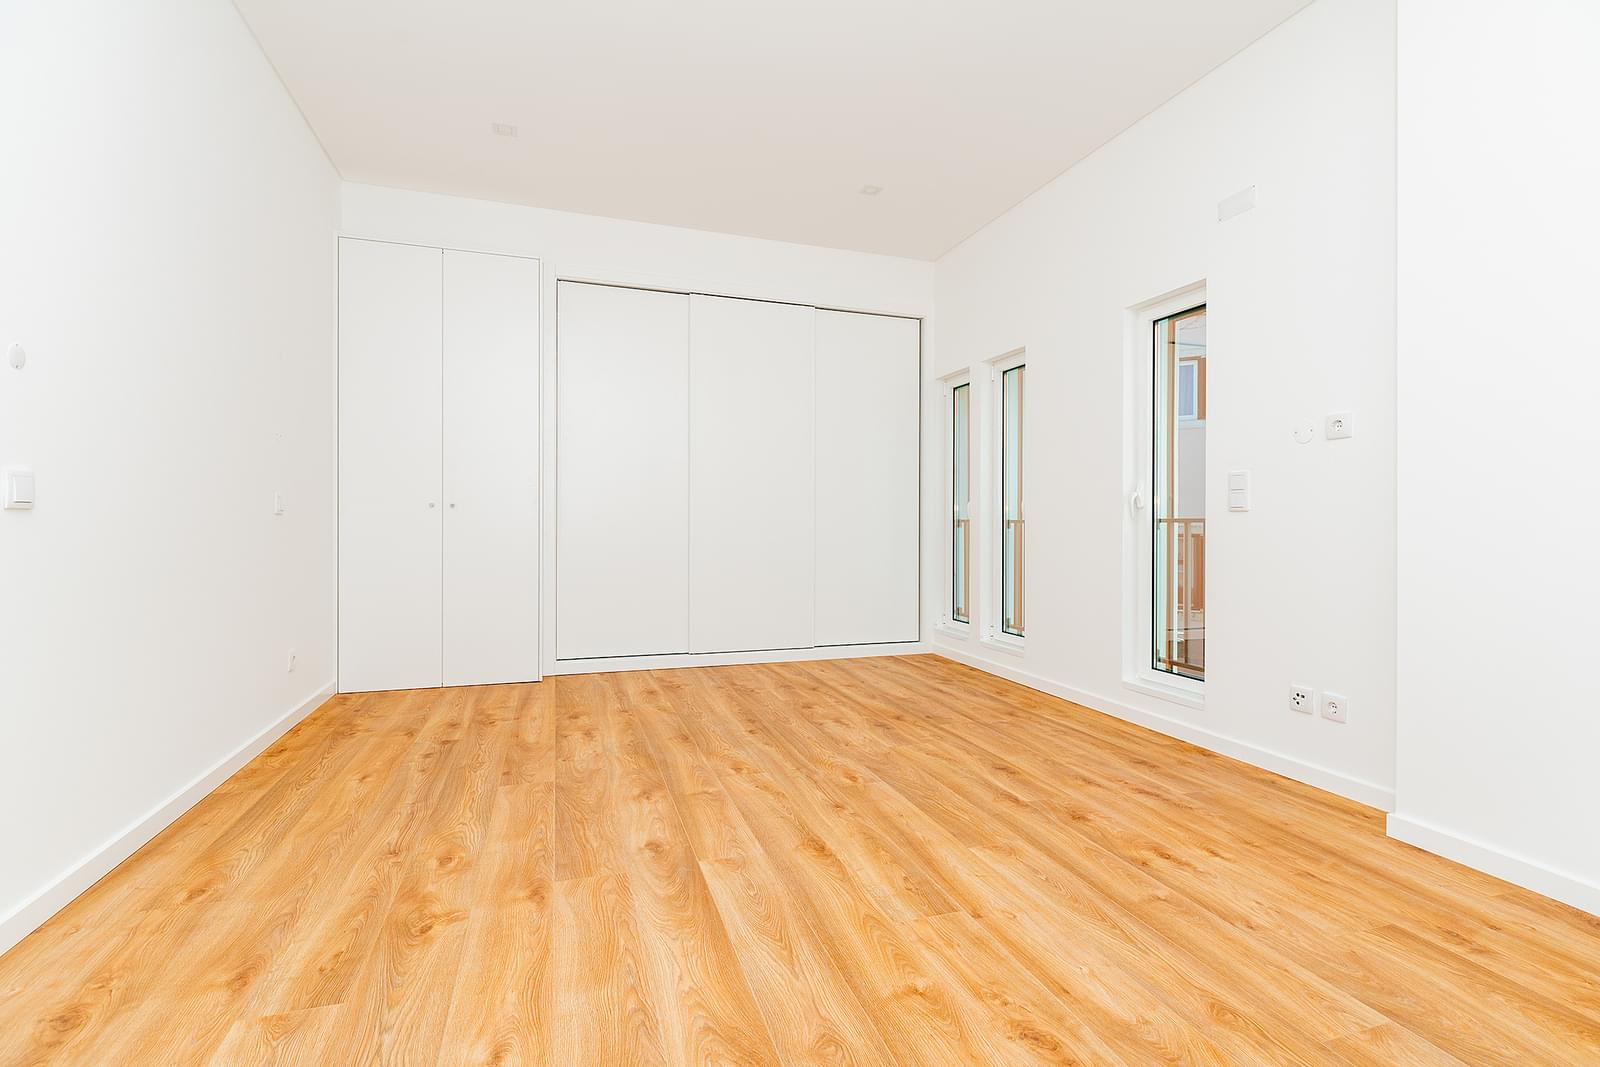 pf18413-apartamento-t1-lisboa-4b93c56a-ba75-4ba6-9d2d-bf4f42931aa6